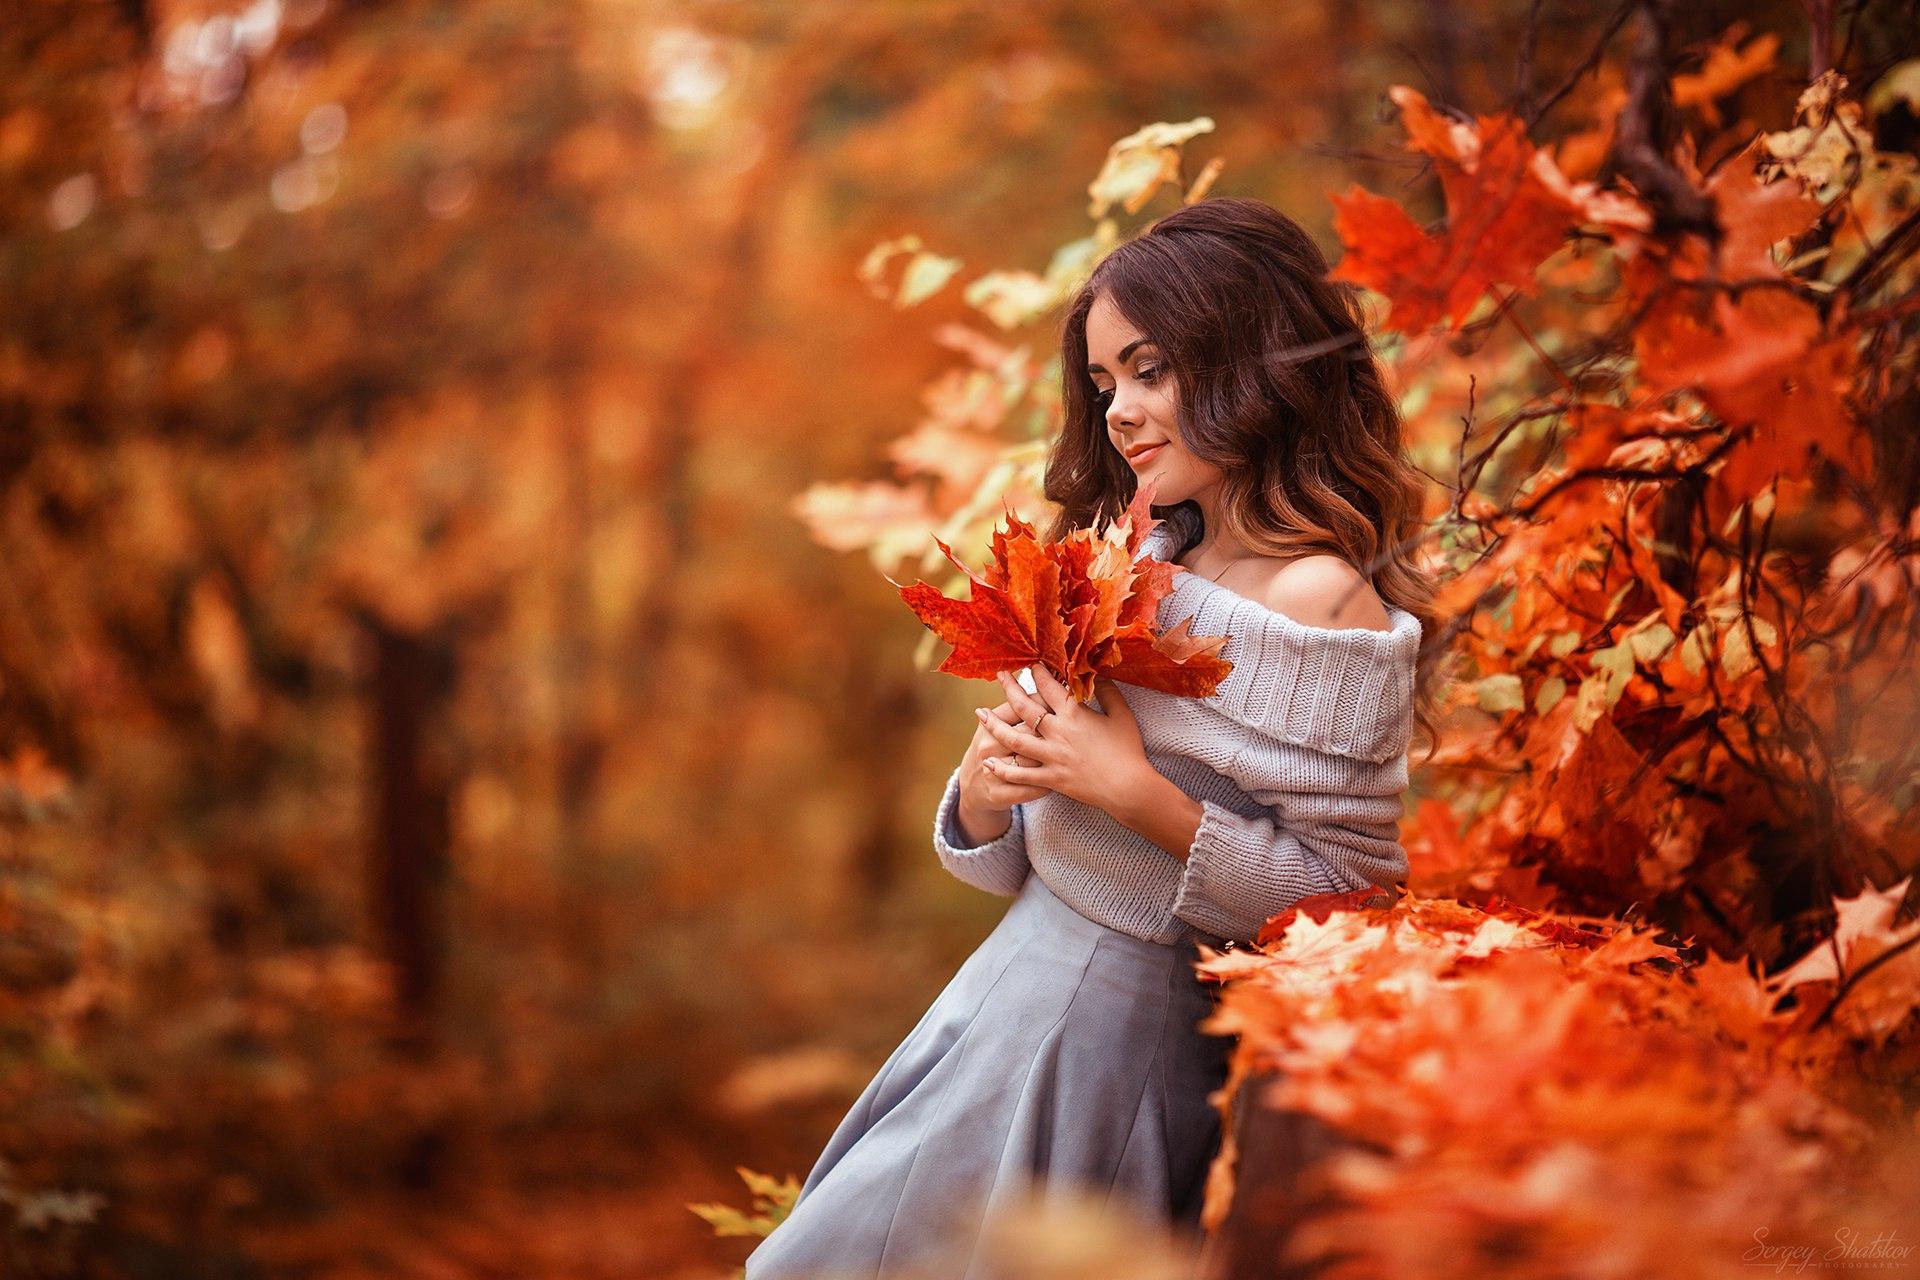 Осень как девушка картинки